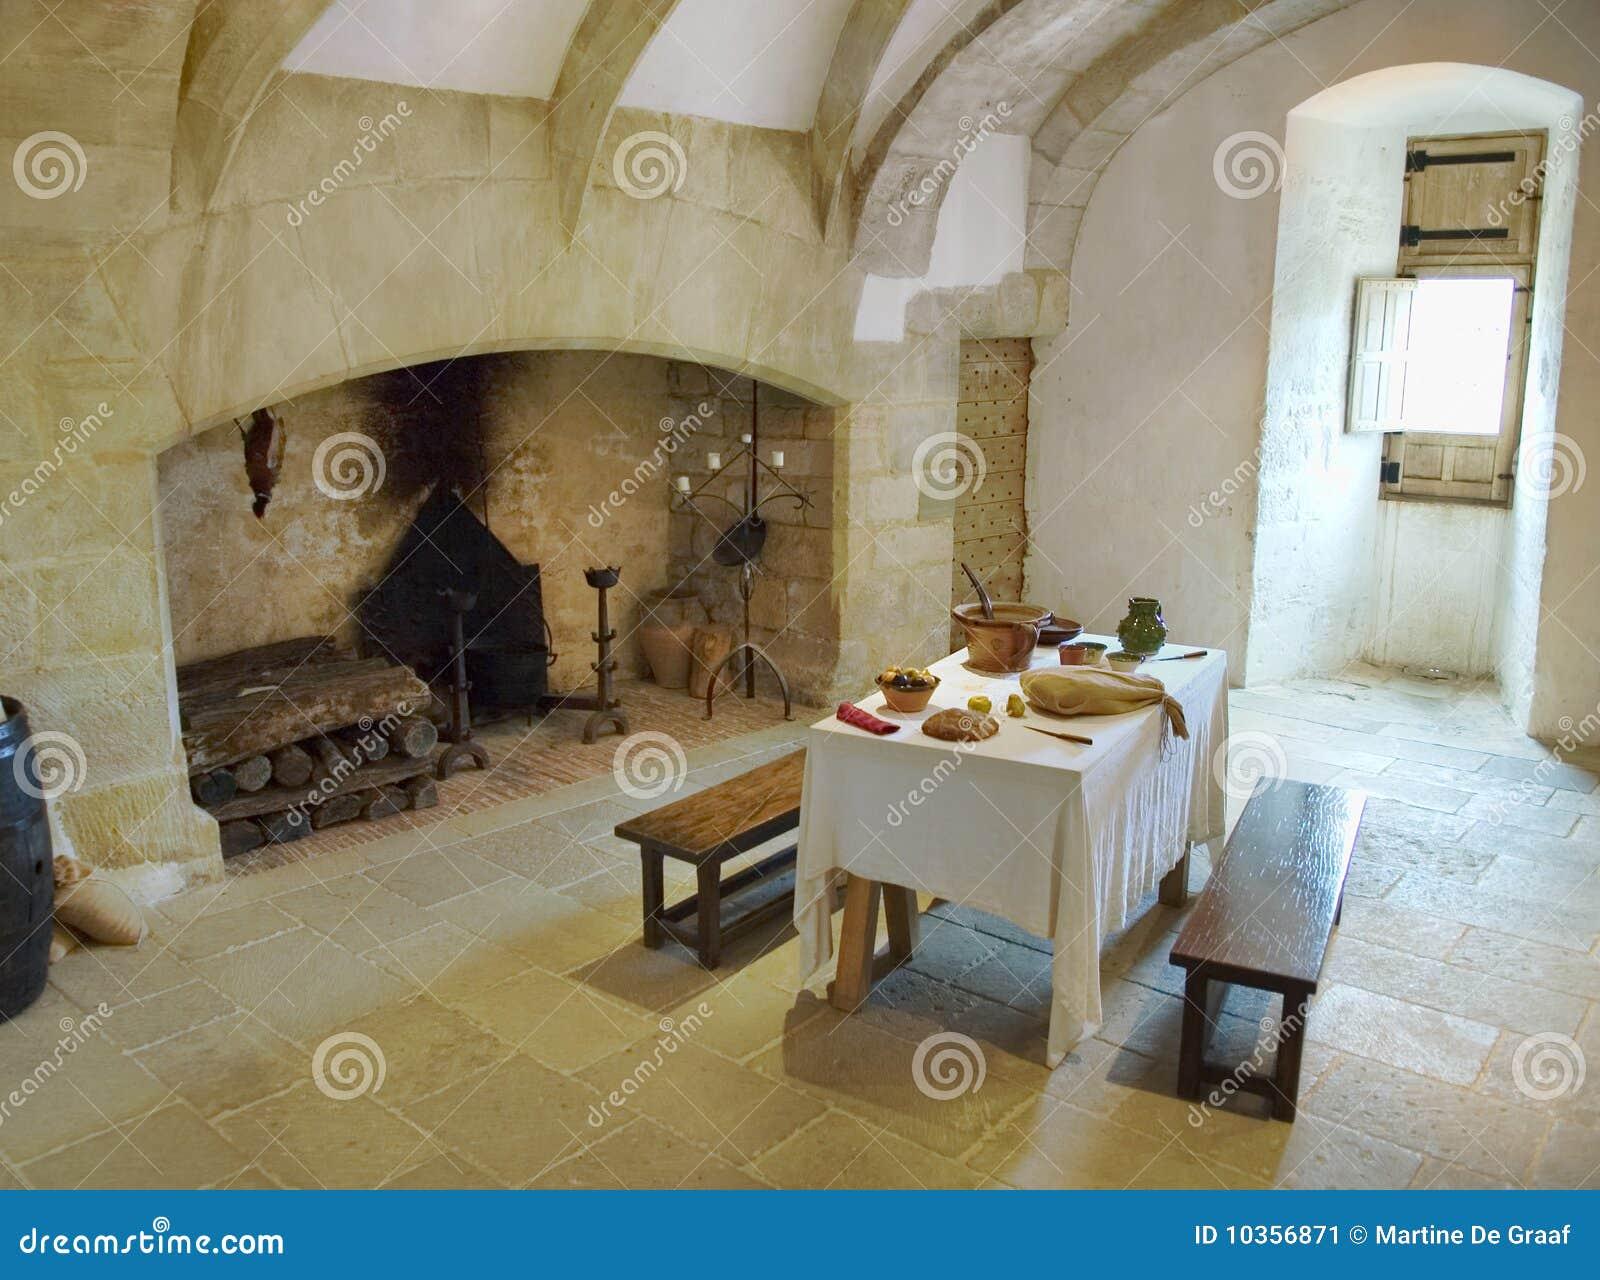 cuisine de ch teau m di vale image stock image 10356871. Black Bedroom Furniture Sets. Home Design Ideas